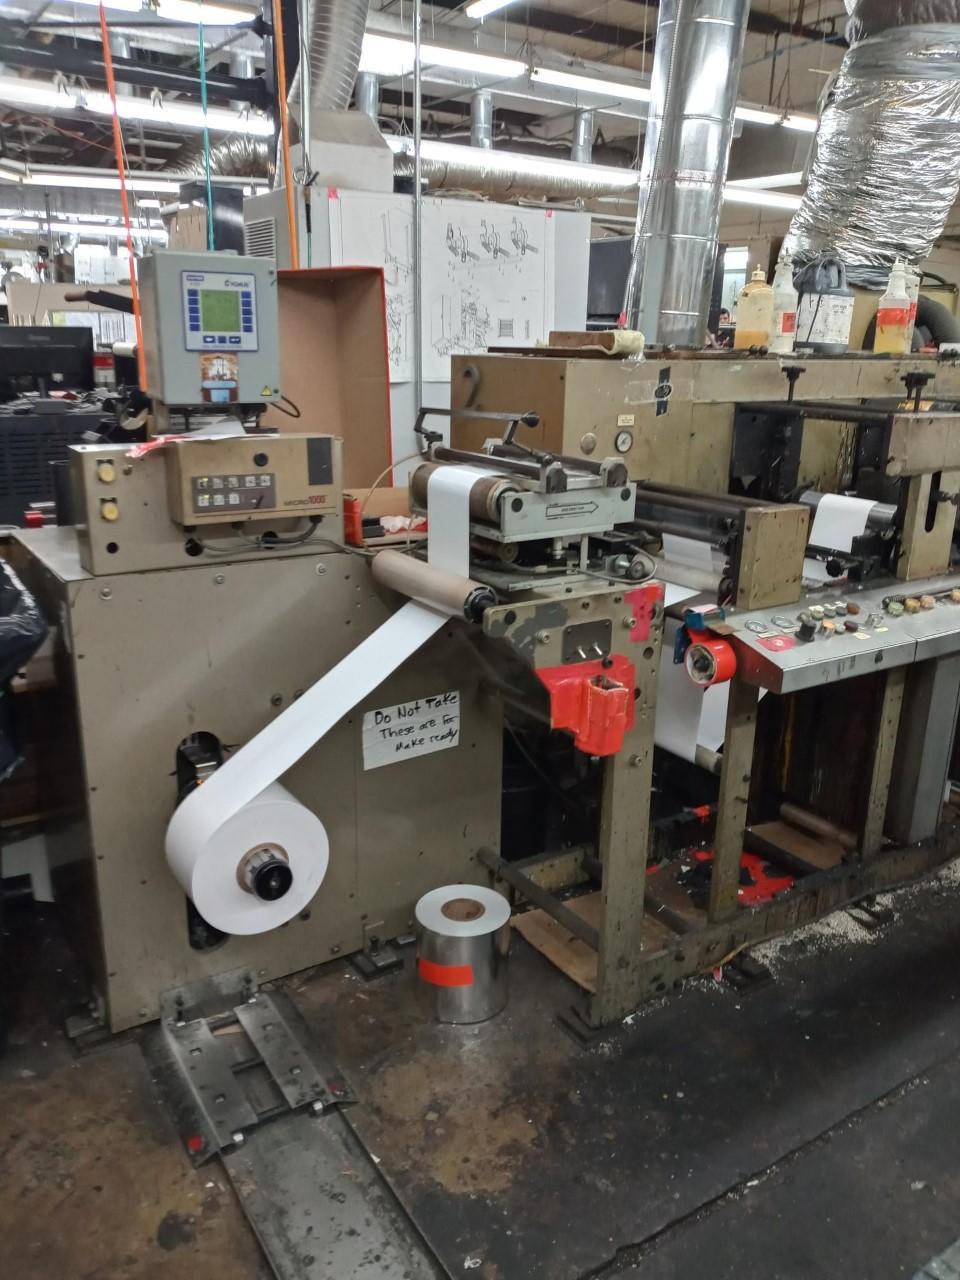 Aquaflex LC1006 - Used Flexo Printing Presses and Used Flexographic Equipment-3